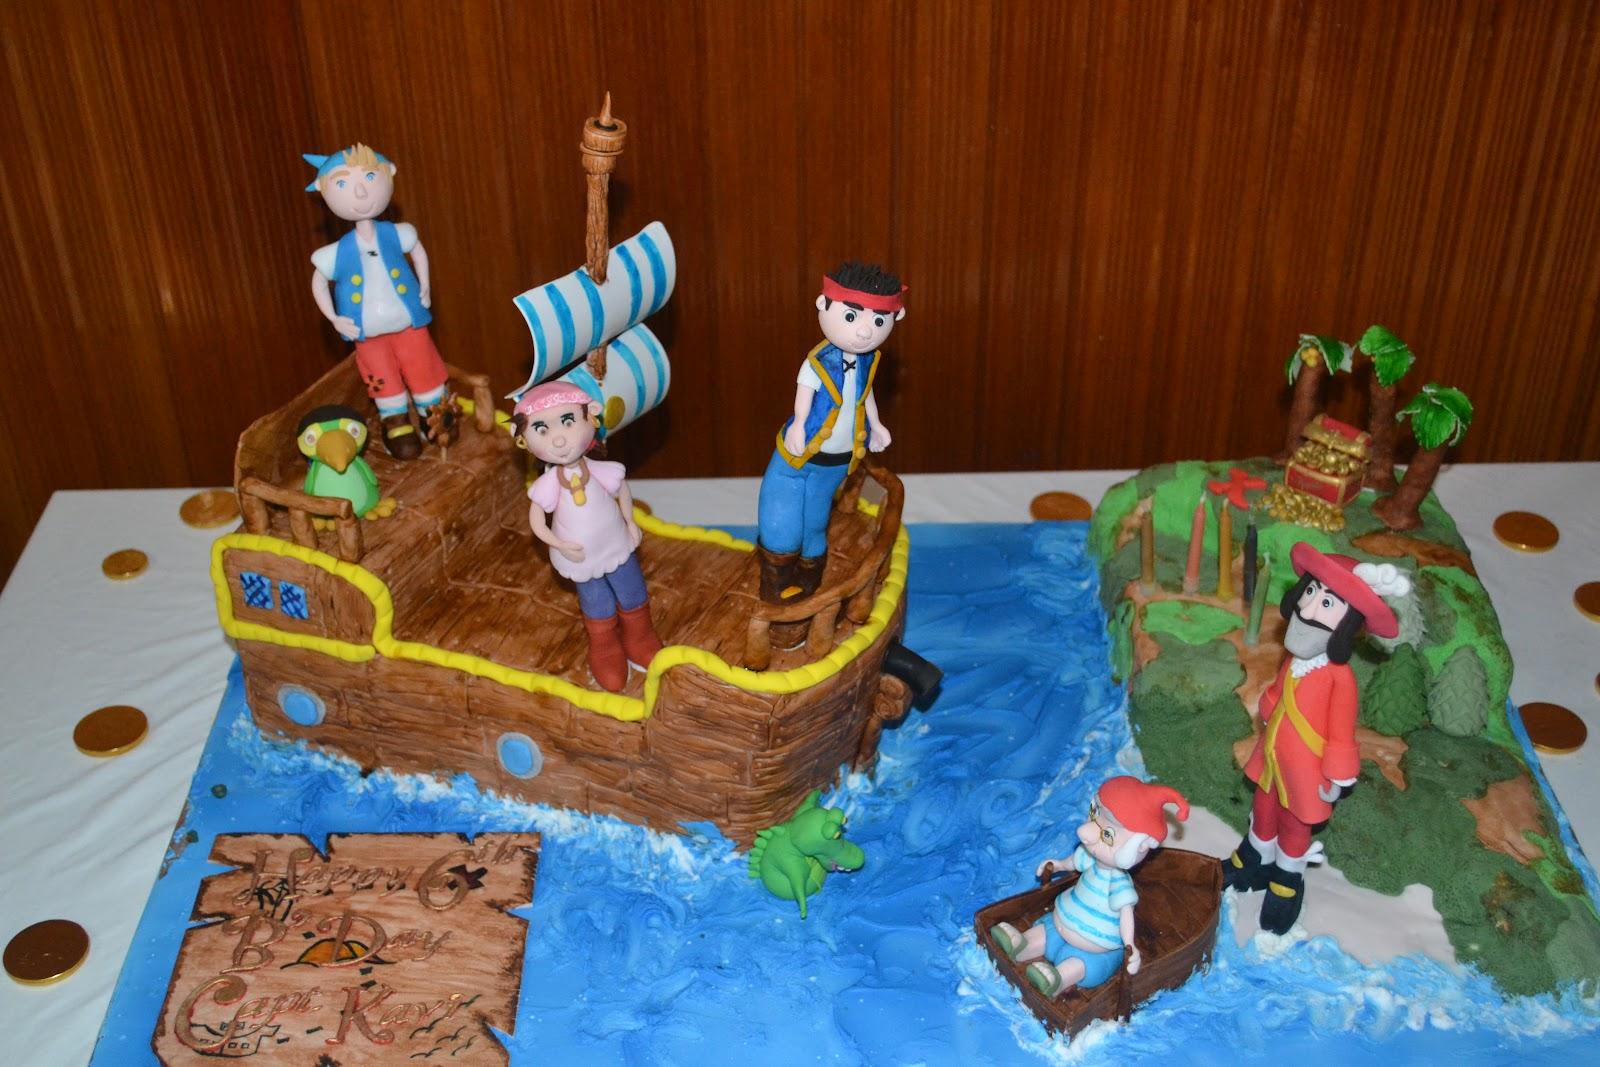 jake and the neverland pirates cake - photo #45